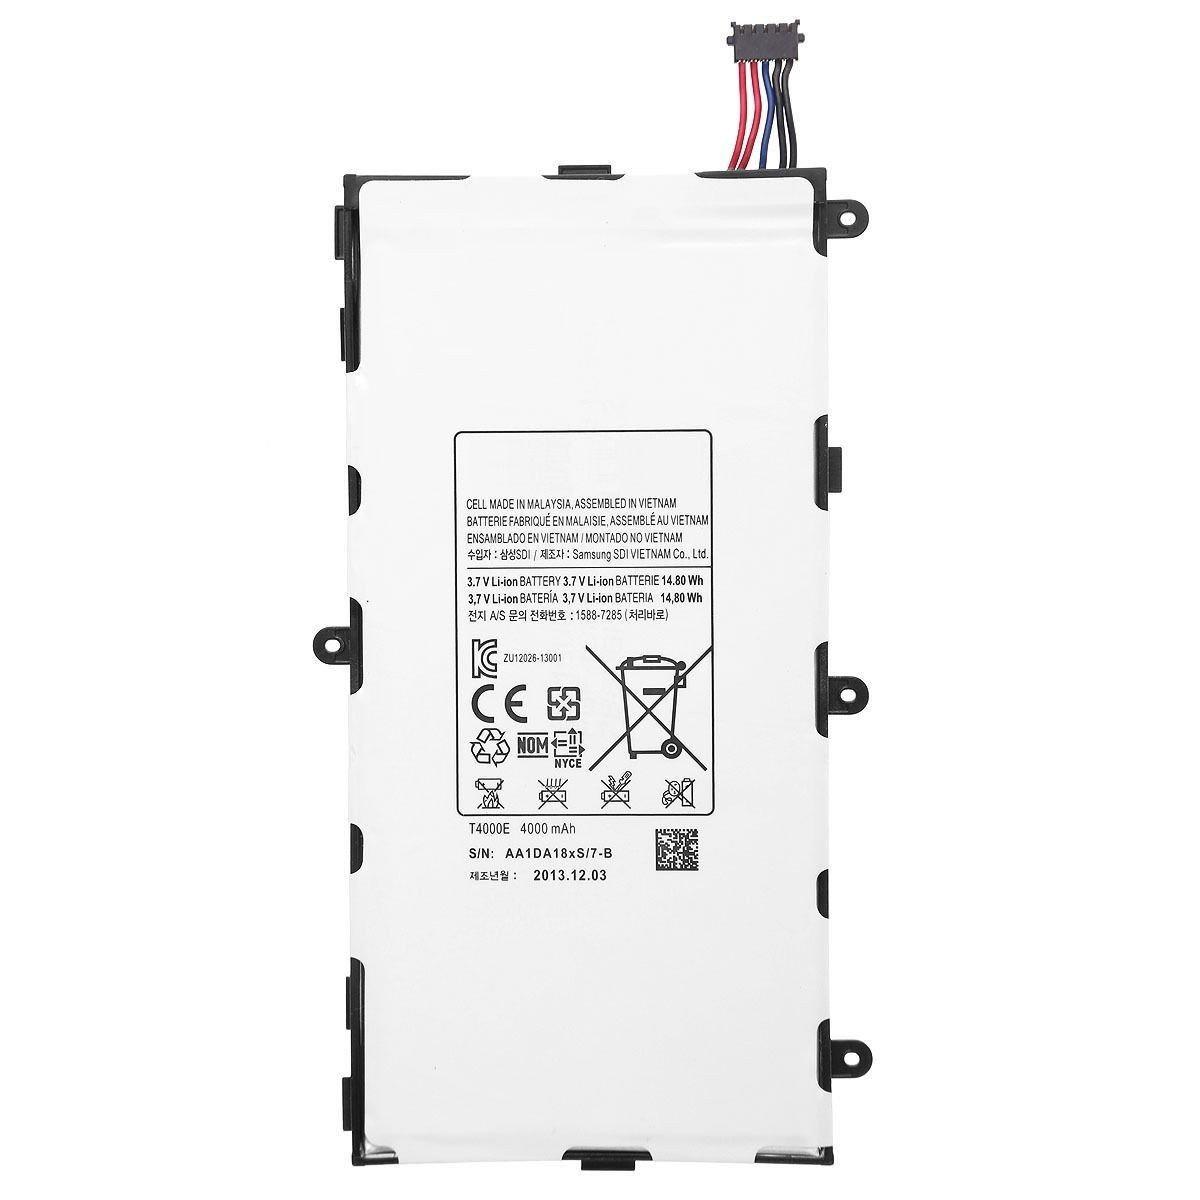 Genuine original samsung galaxy tab 3 8 0 original oem - Amazon Com Samsung Galaxy Tab 3 7 0 Replacement Battery Cell Phones Accessories